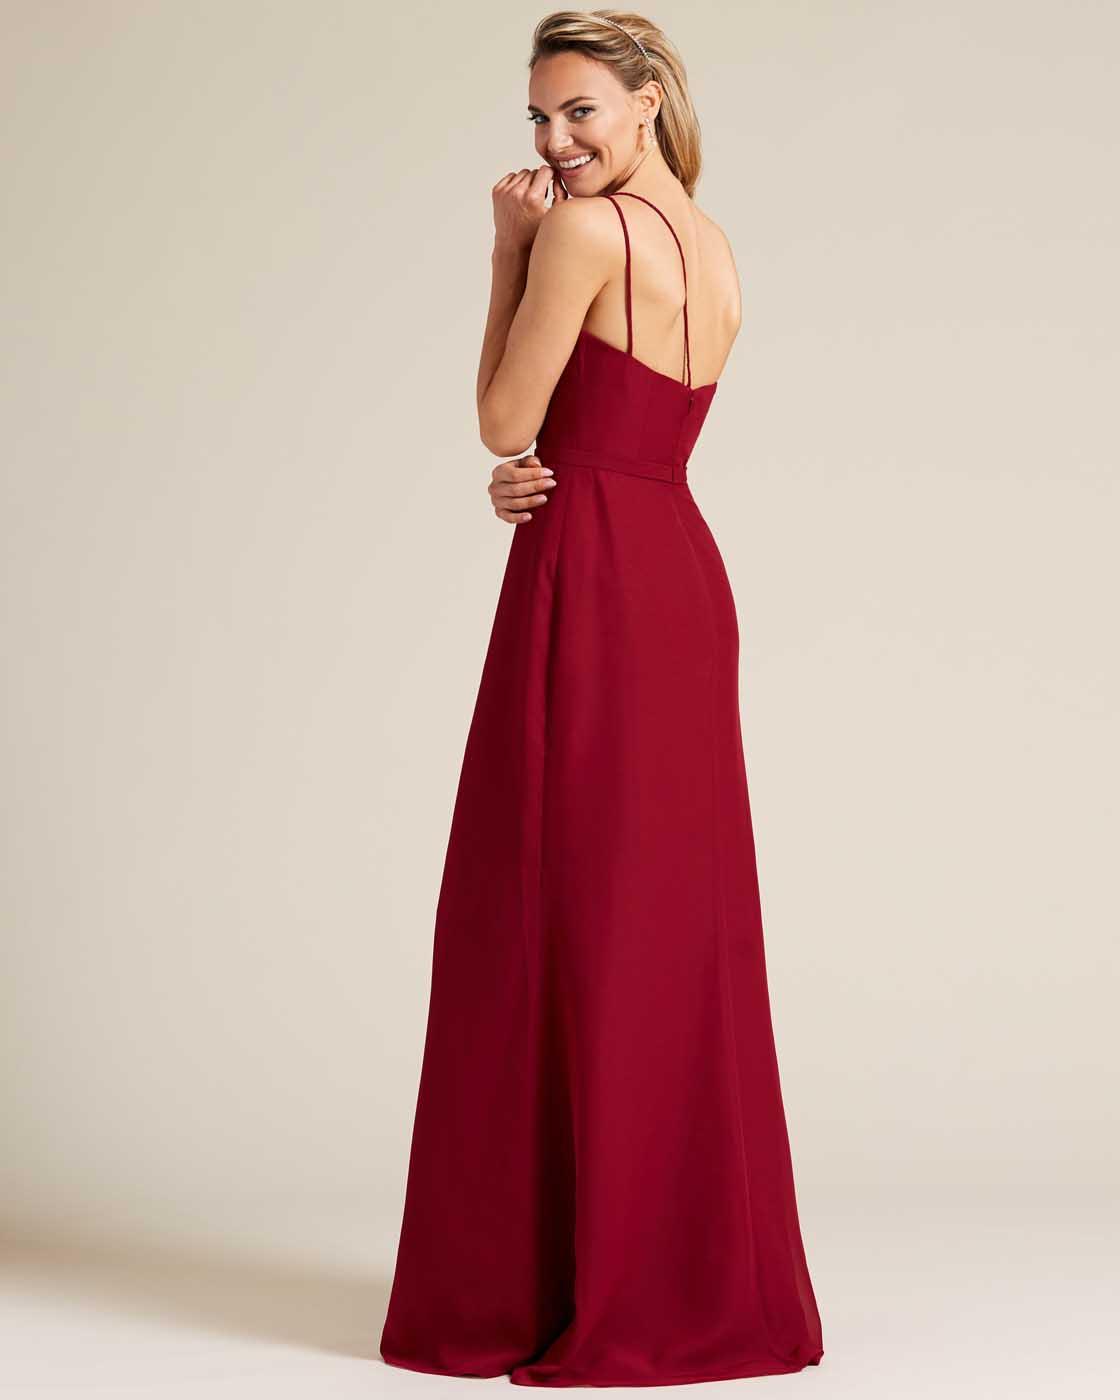 Wine Red One Shoulder Special Occasion Dress  - Back